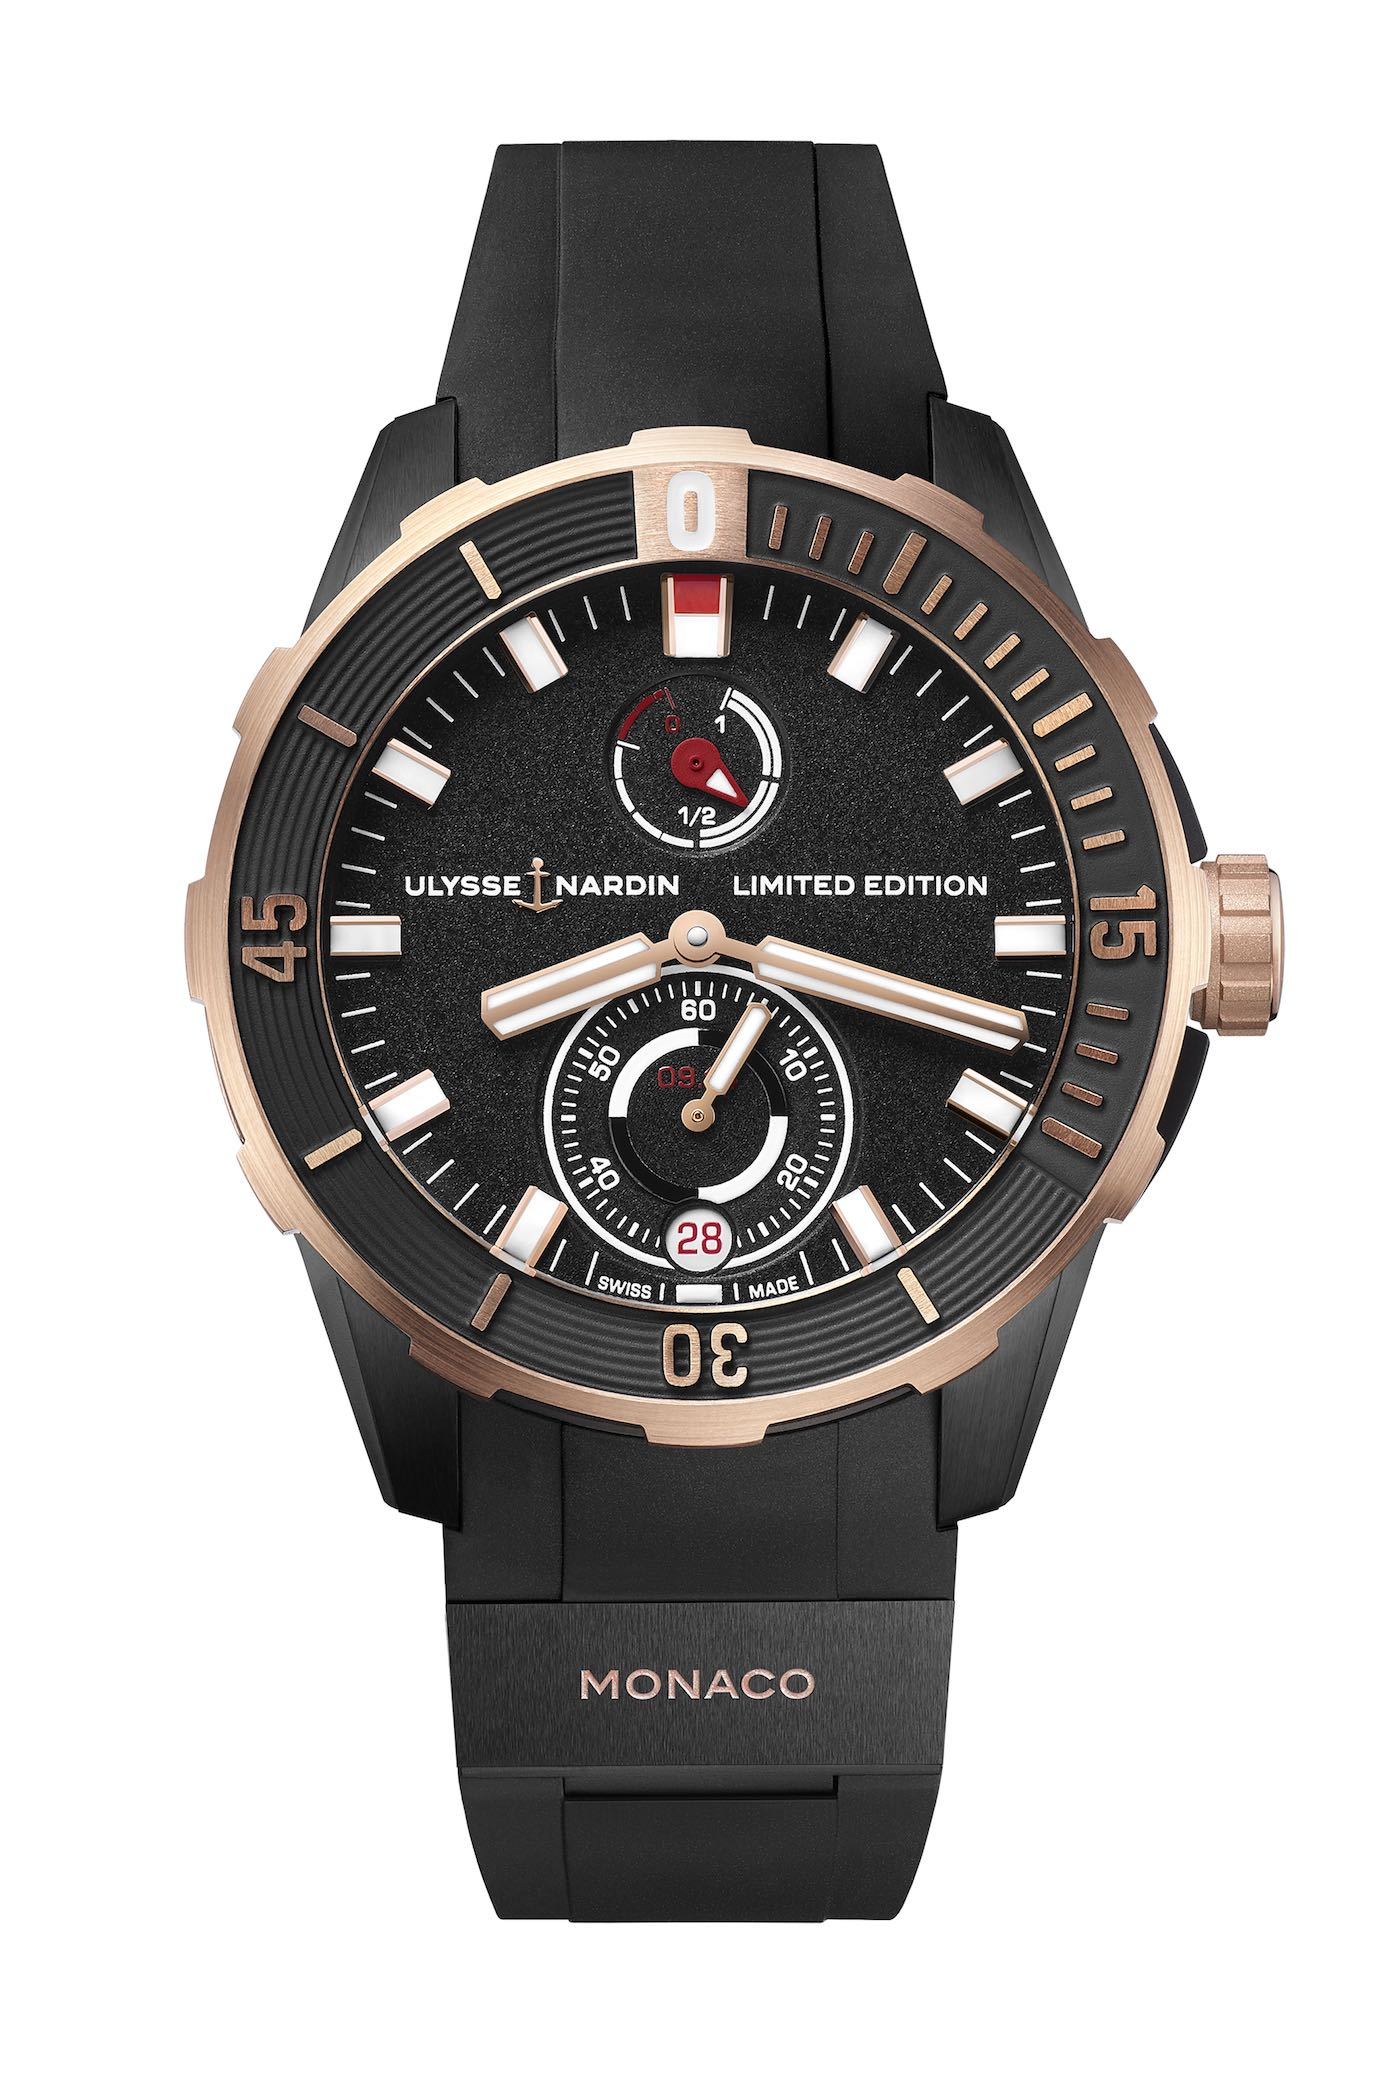 2018 Ulysse Nardin Diver Chronometer Monaco Limited Edition